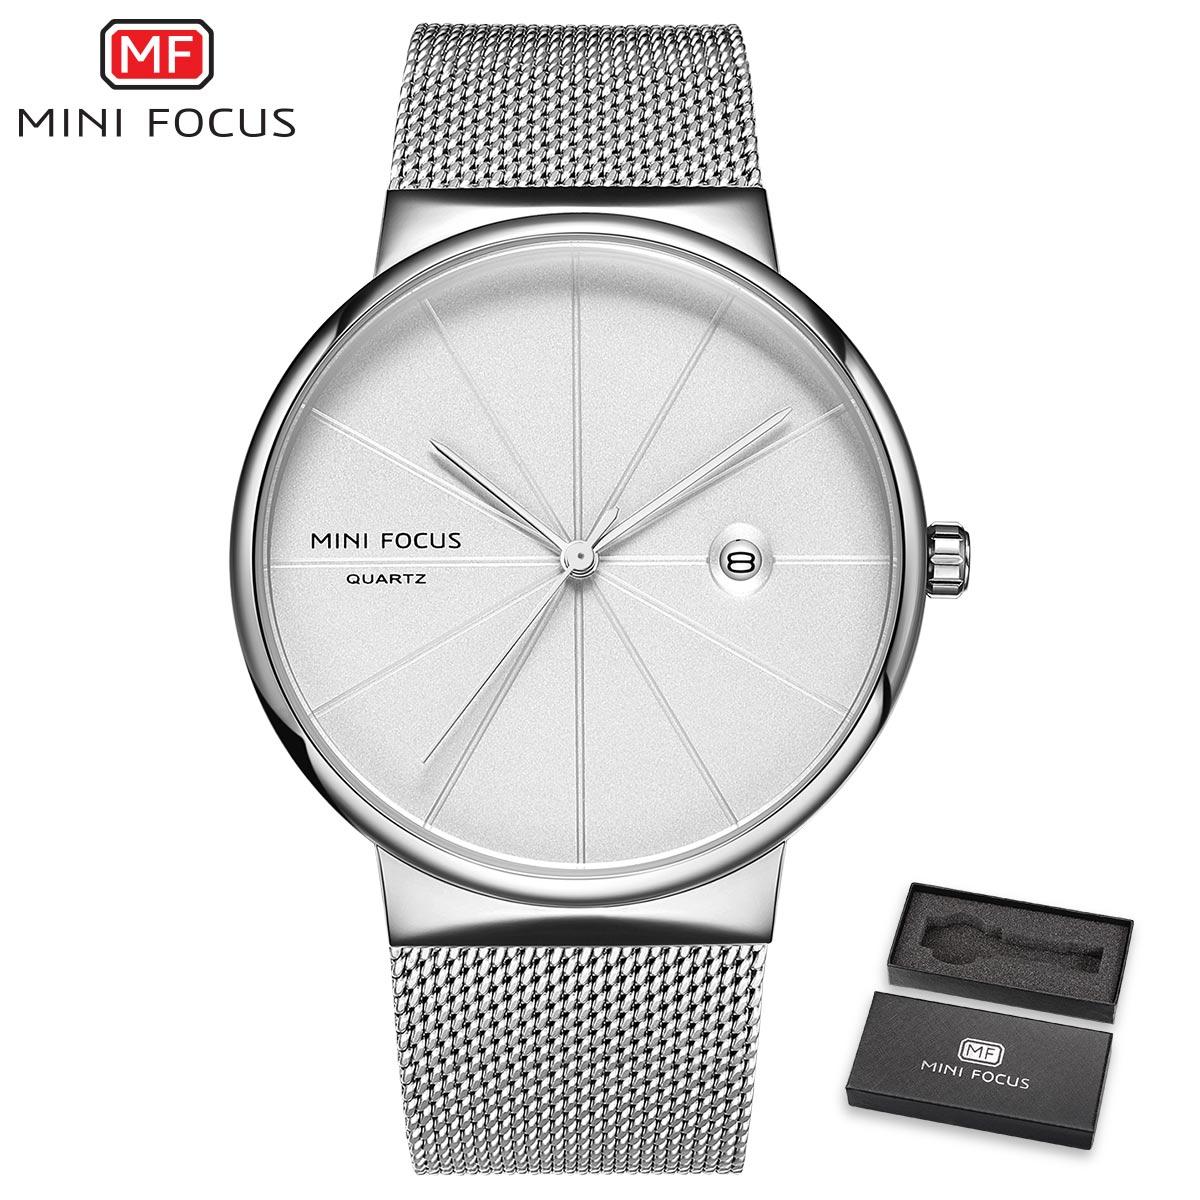 MINI FOCUS Classic Wristwatch Mens Quartz Clock Ultra Thin Silver Mesh Strap Date Display Fashion Minimalist Watch + Gift Box